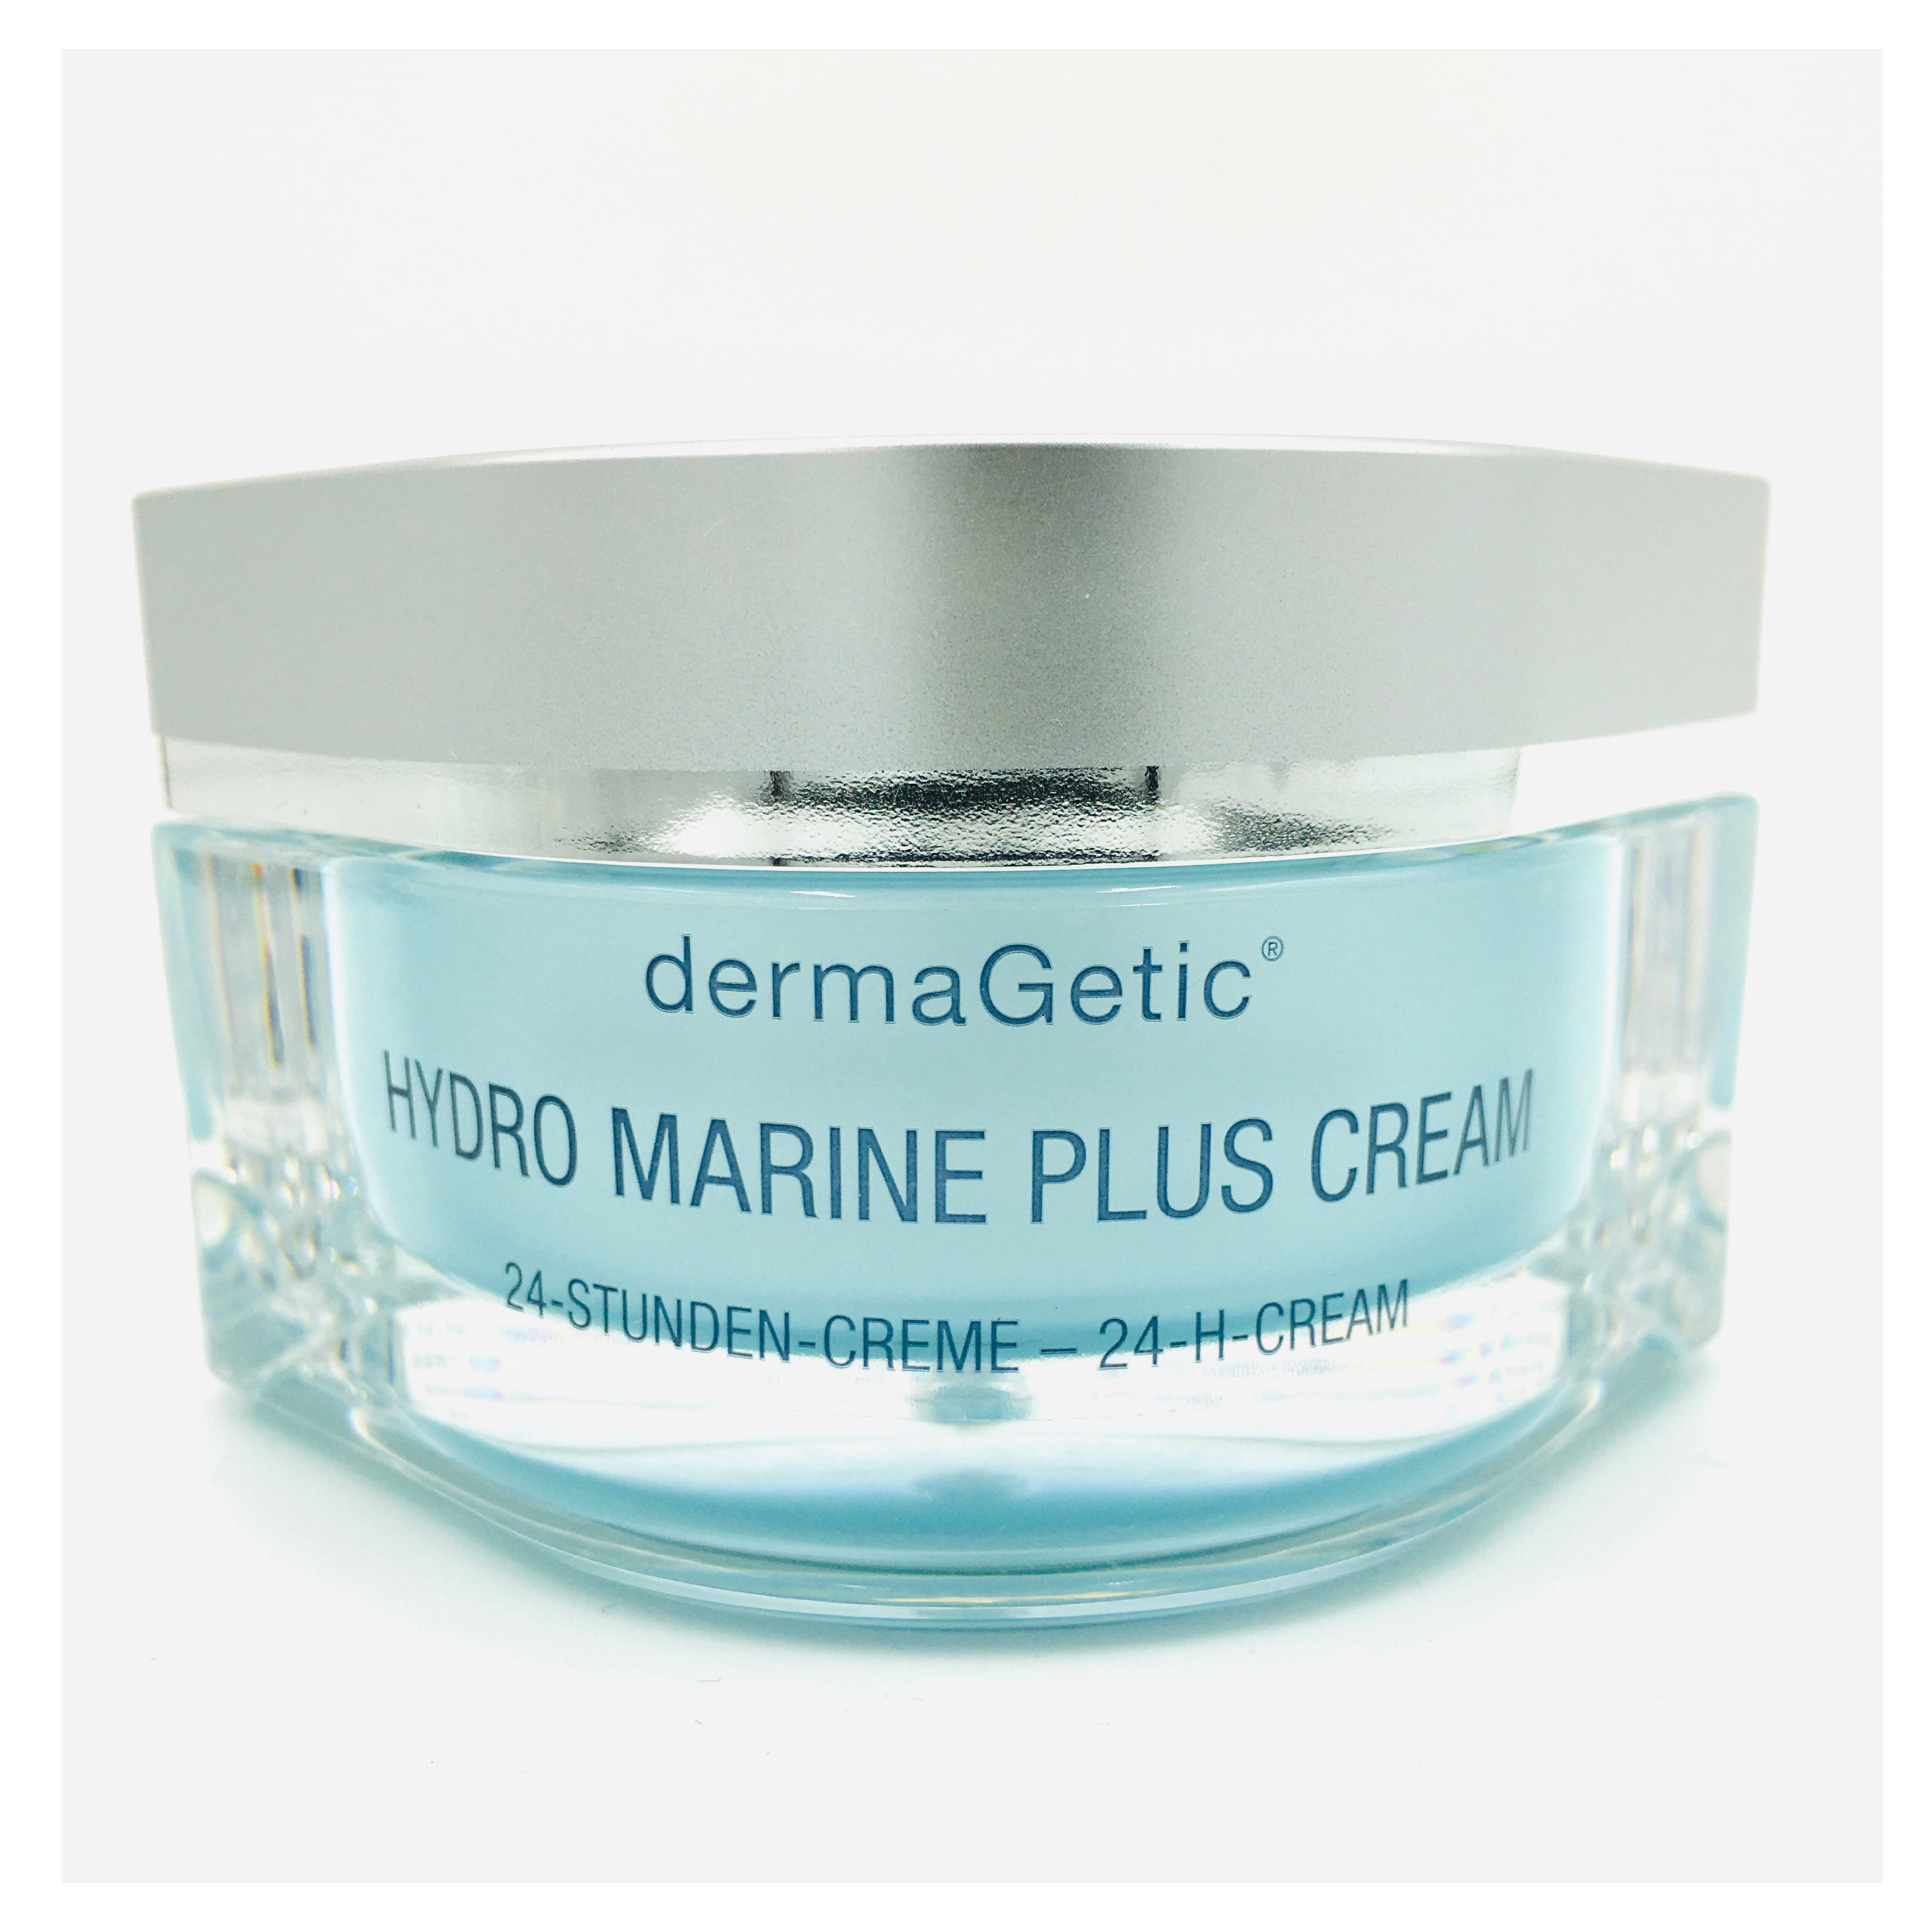 Hydra Marine Plus Creme